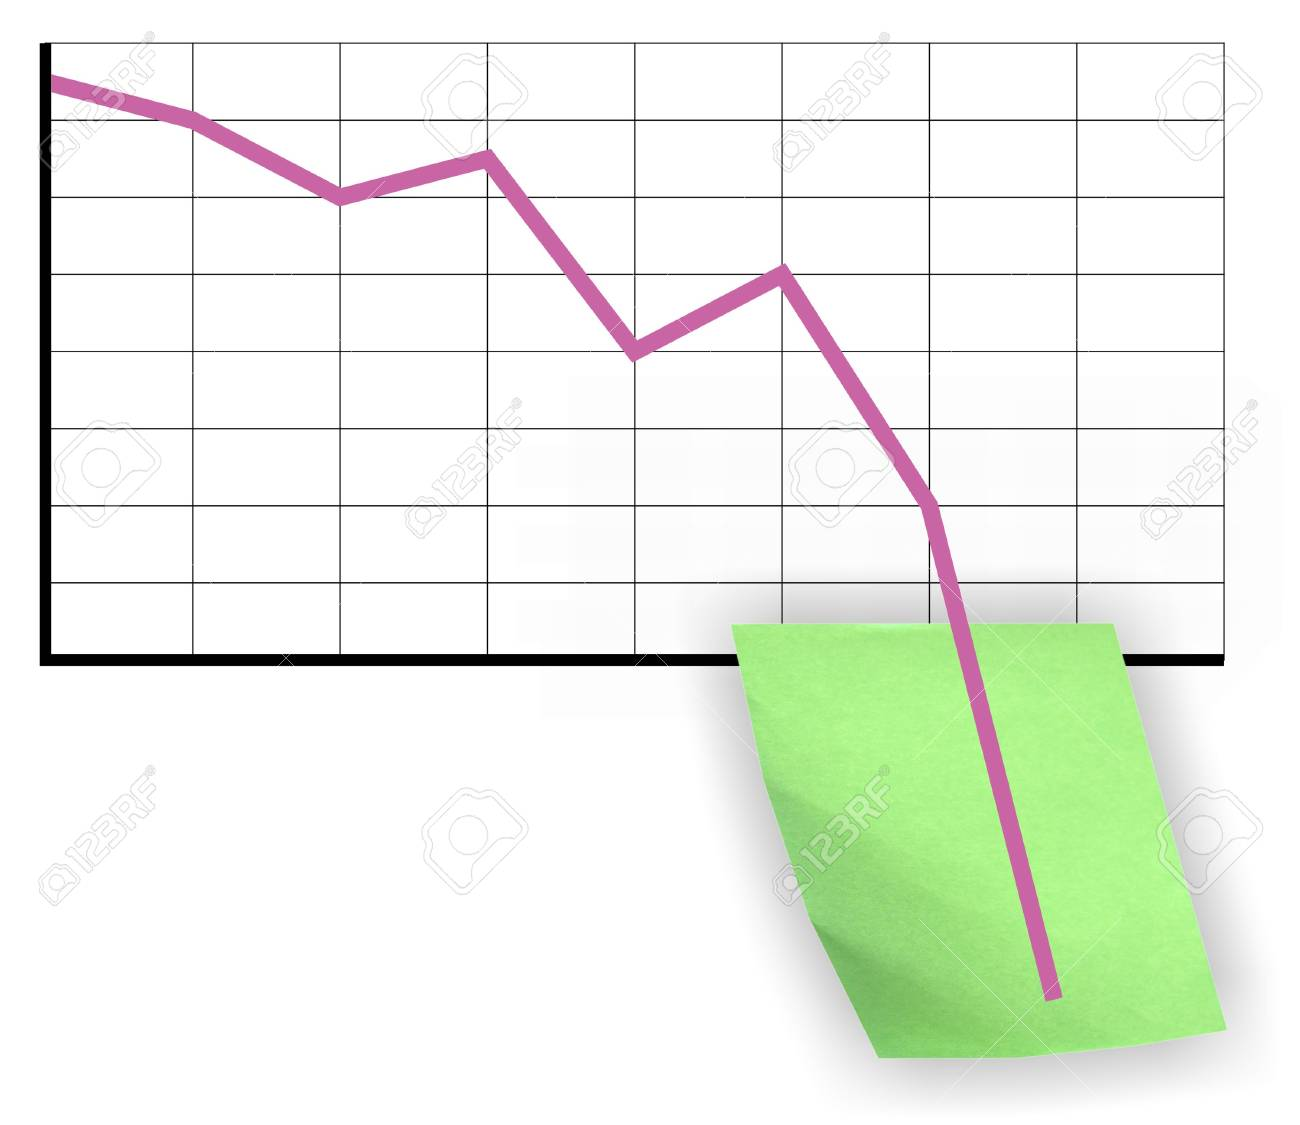 Crisis chart Stock Photo - 4009713